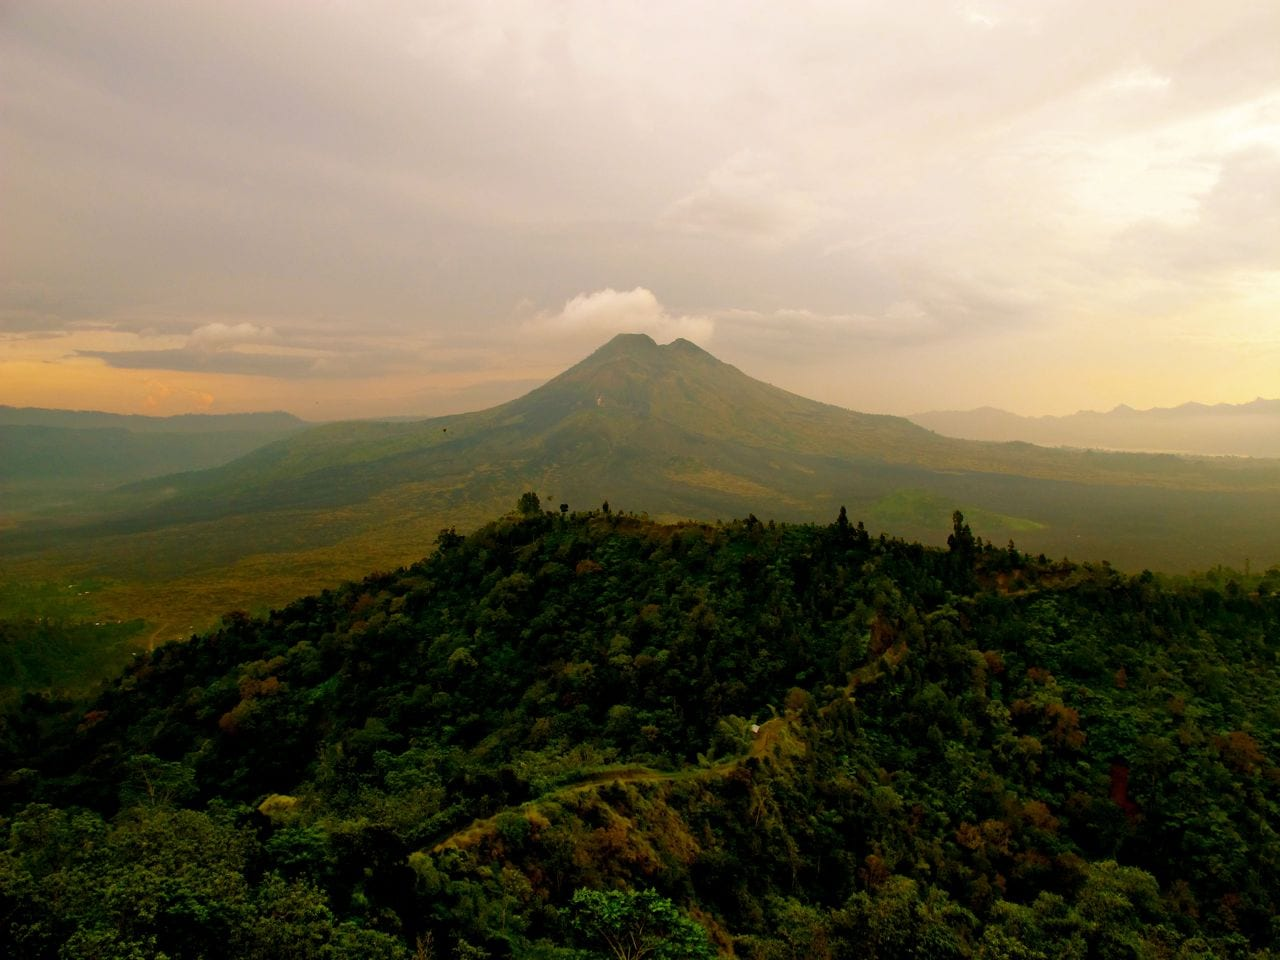 bali volcano - photo #3